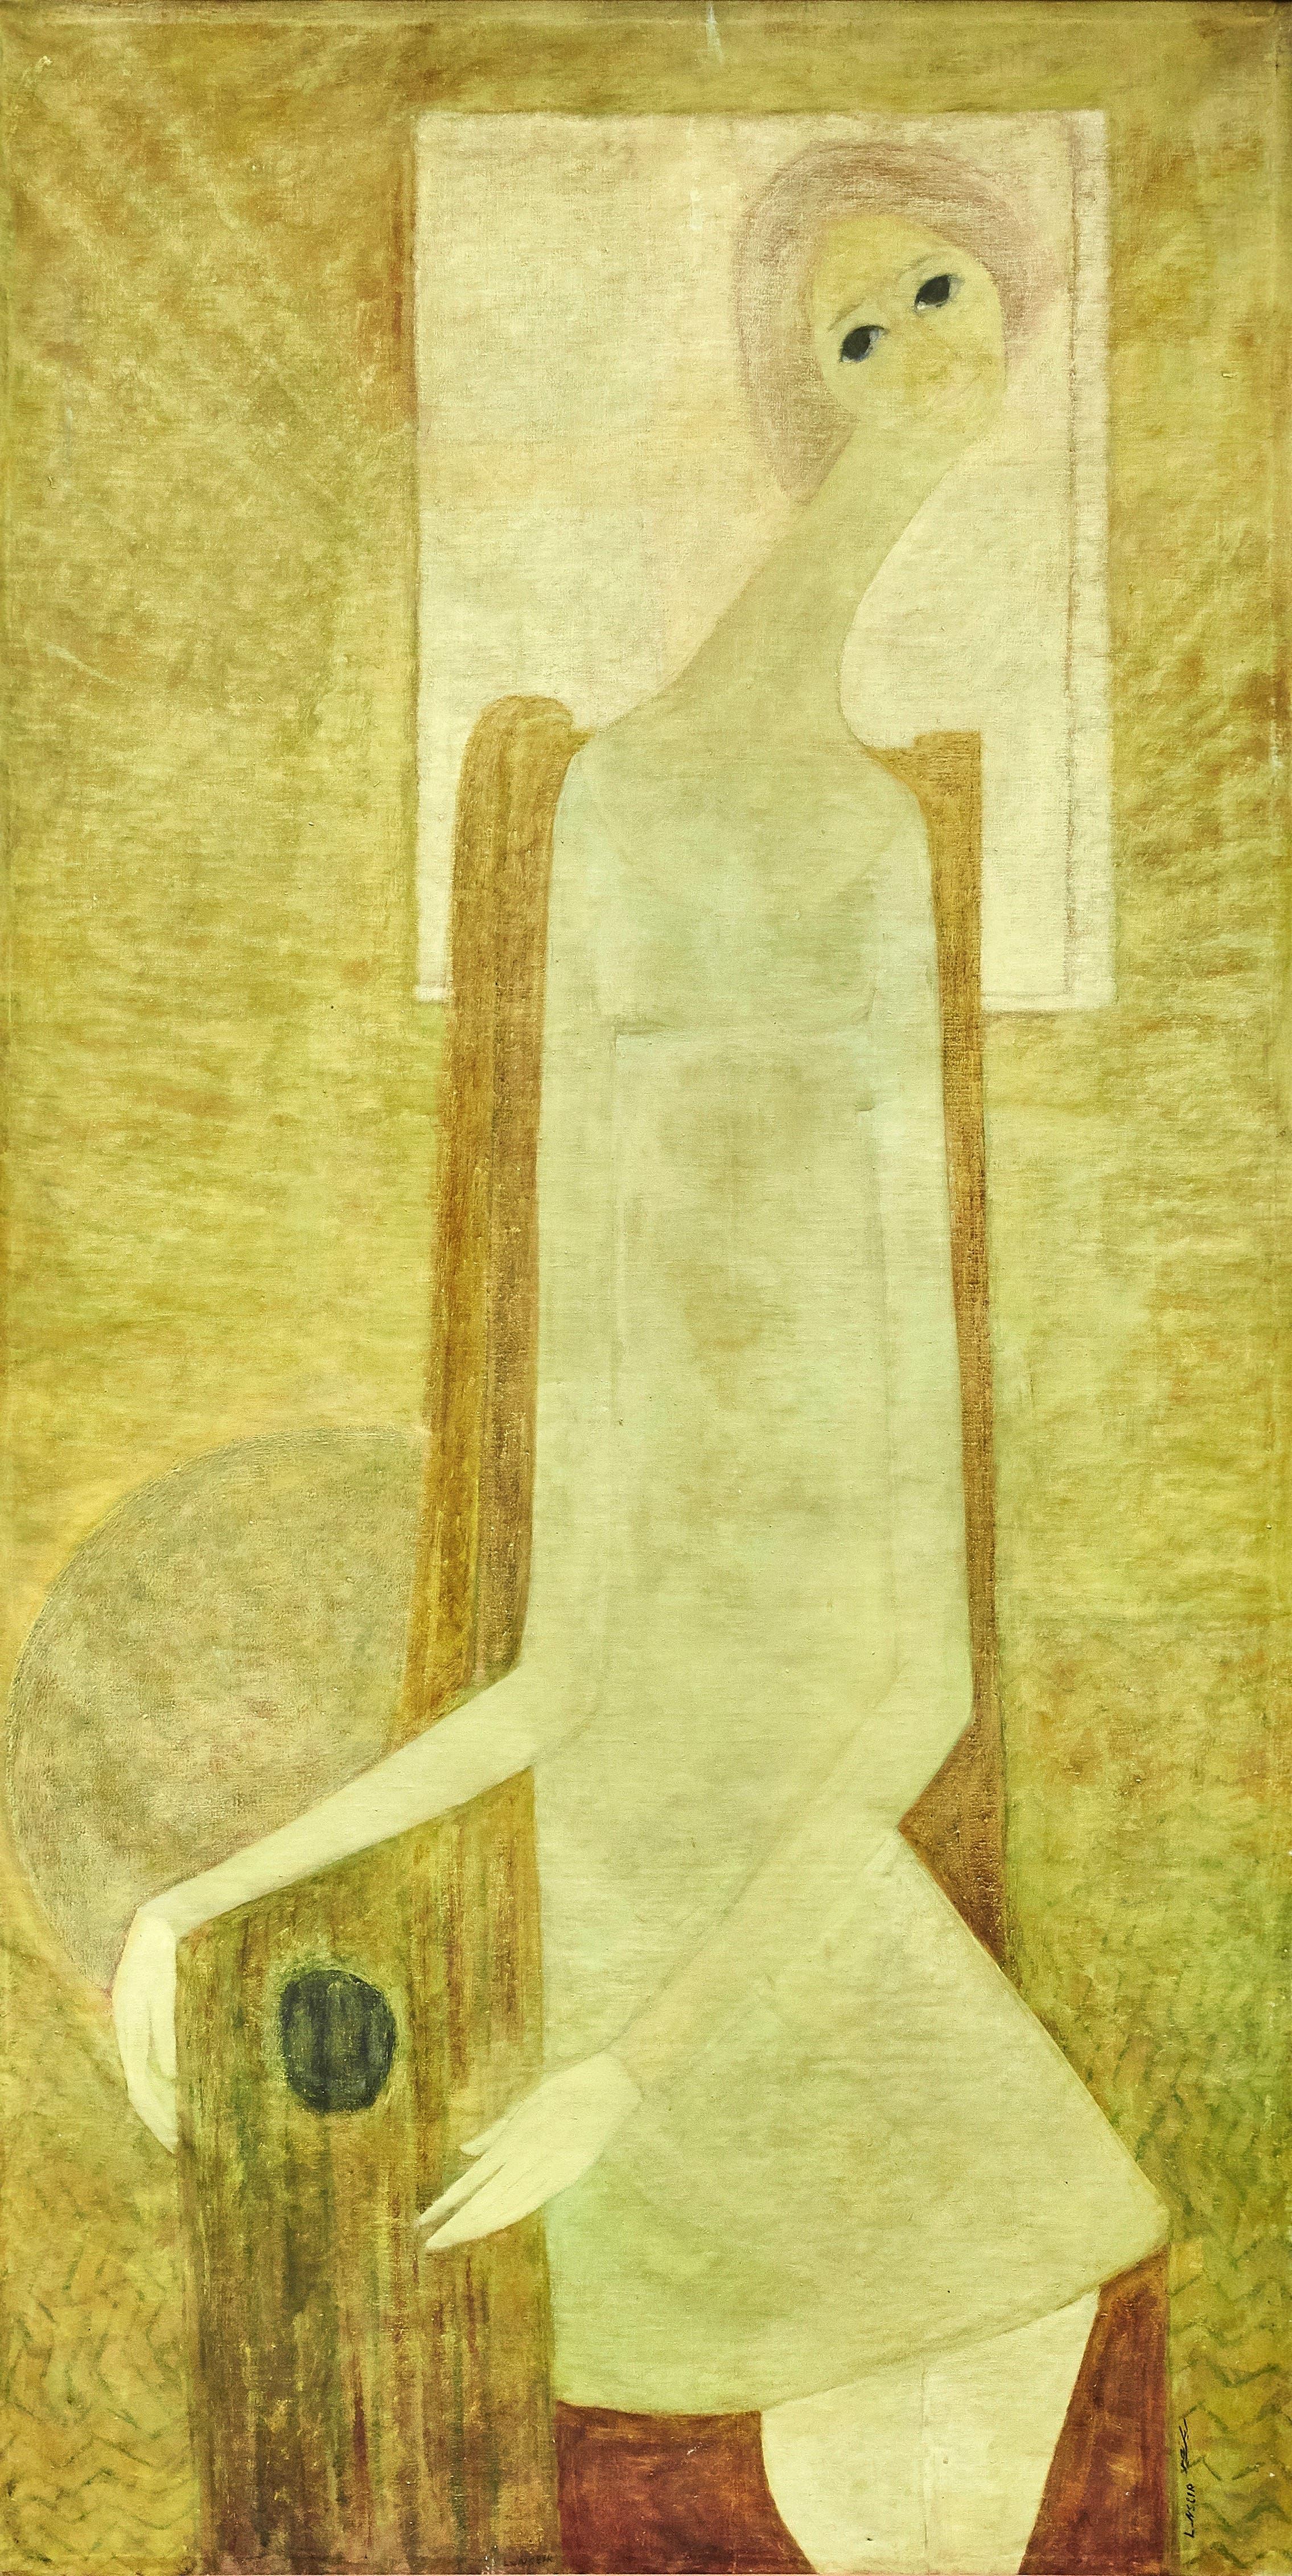 Leila Nseir, Motherhood, 1970, Oil on canvas, 202 x 102 cm. (Image courtesy of Barjeel Art Foundation, Sharjah.)